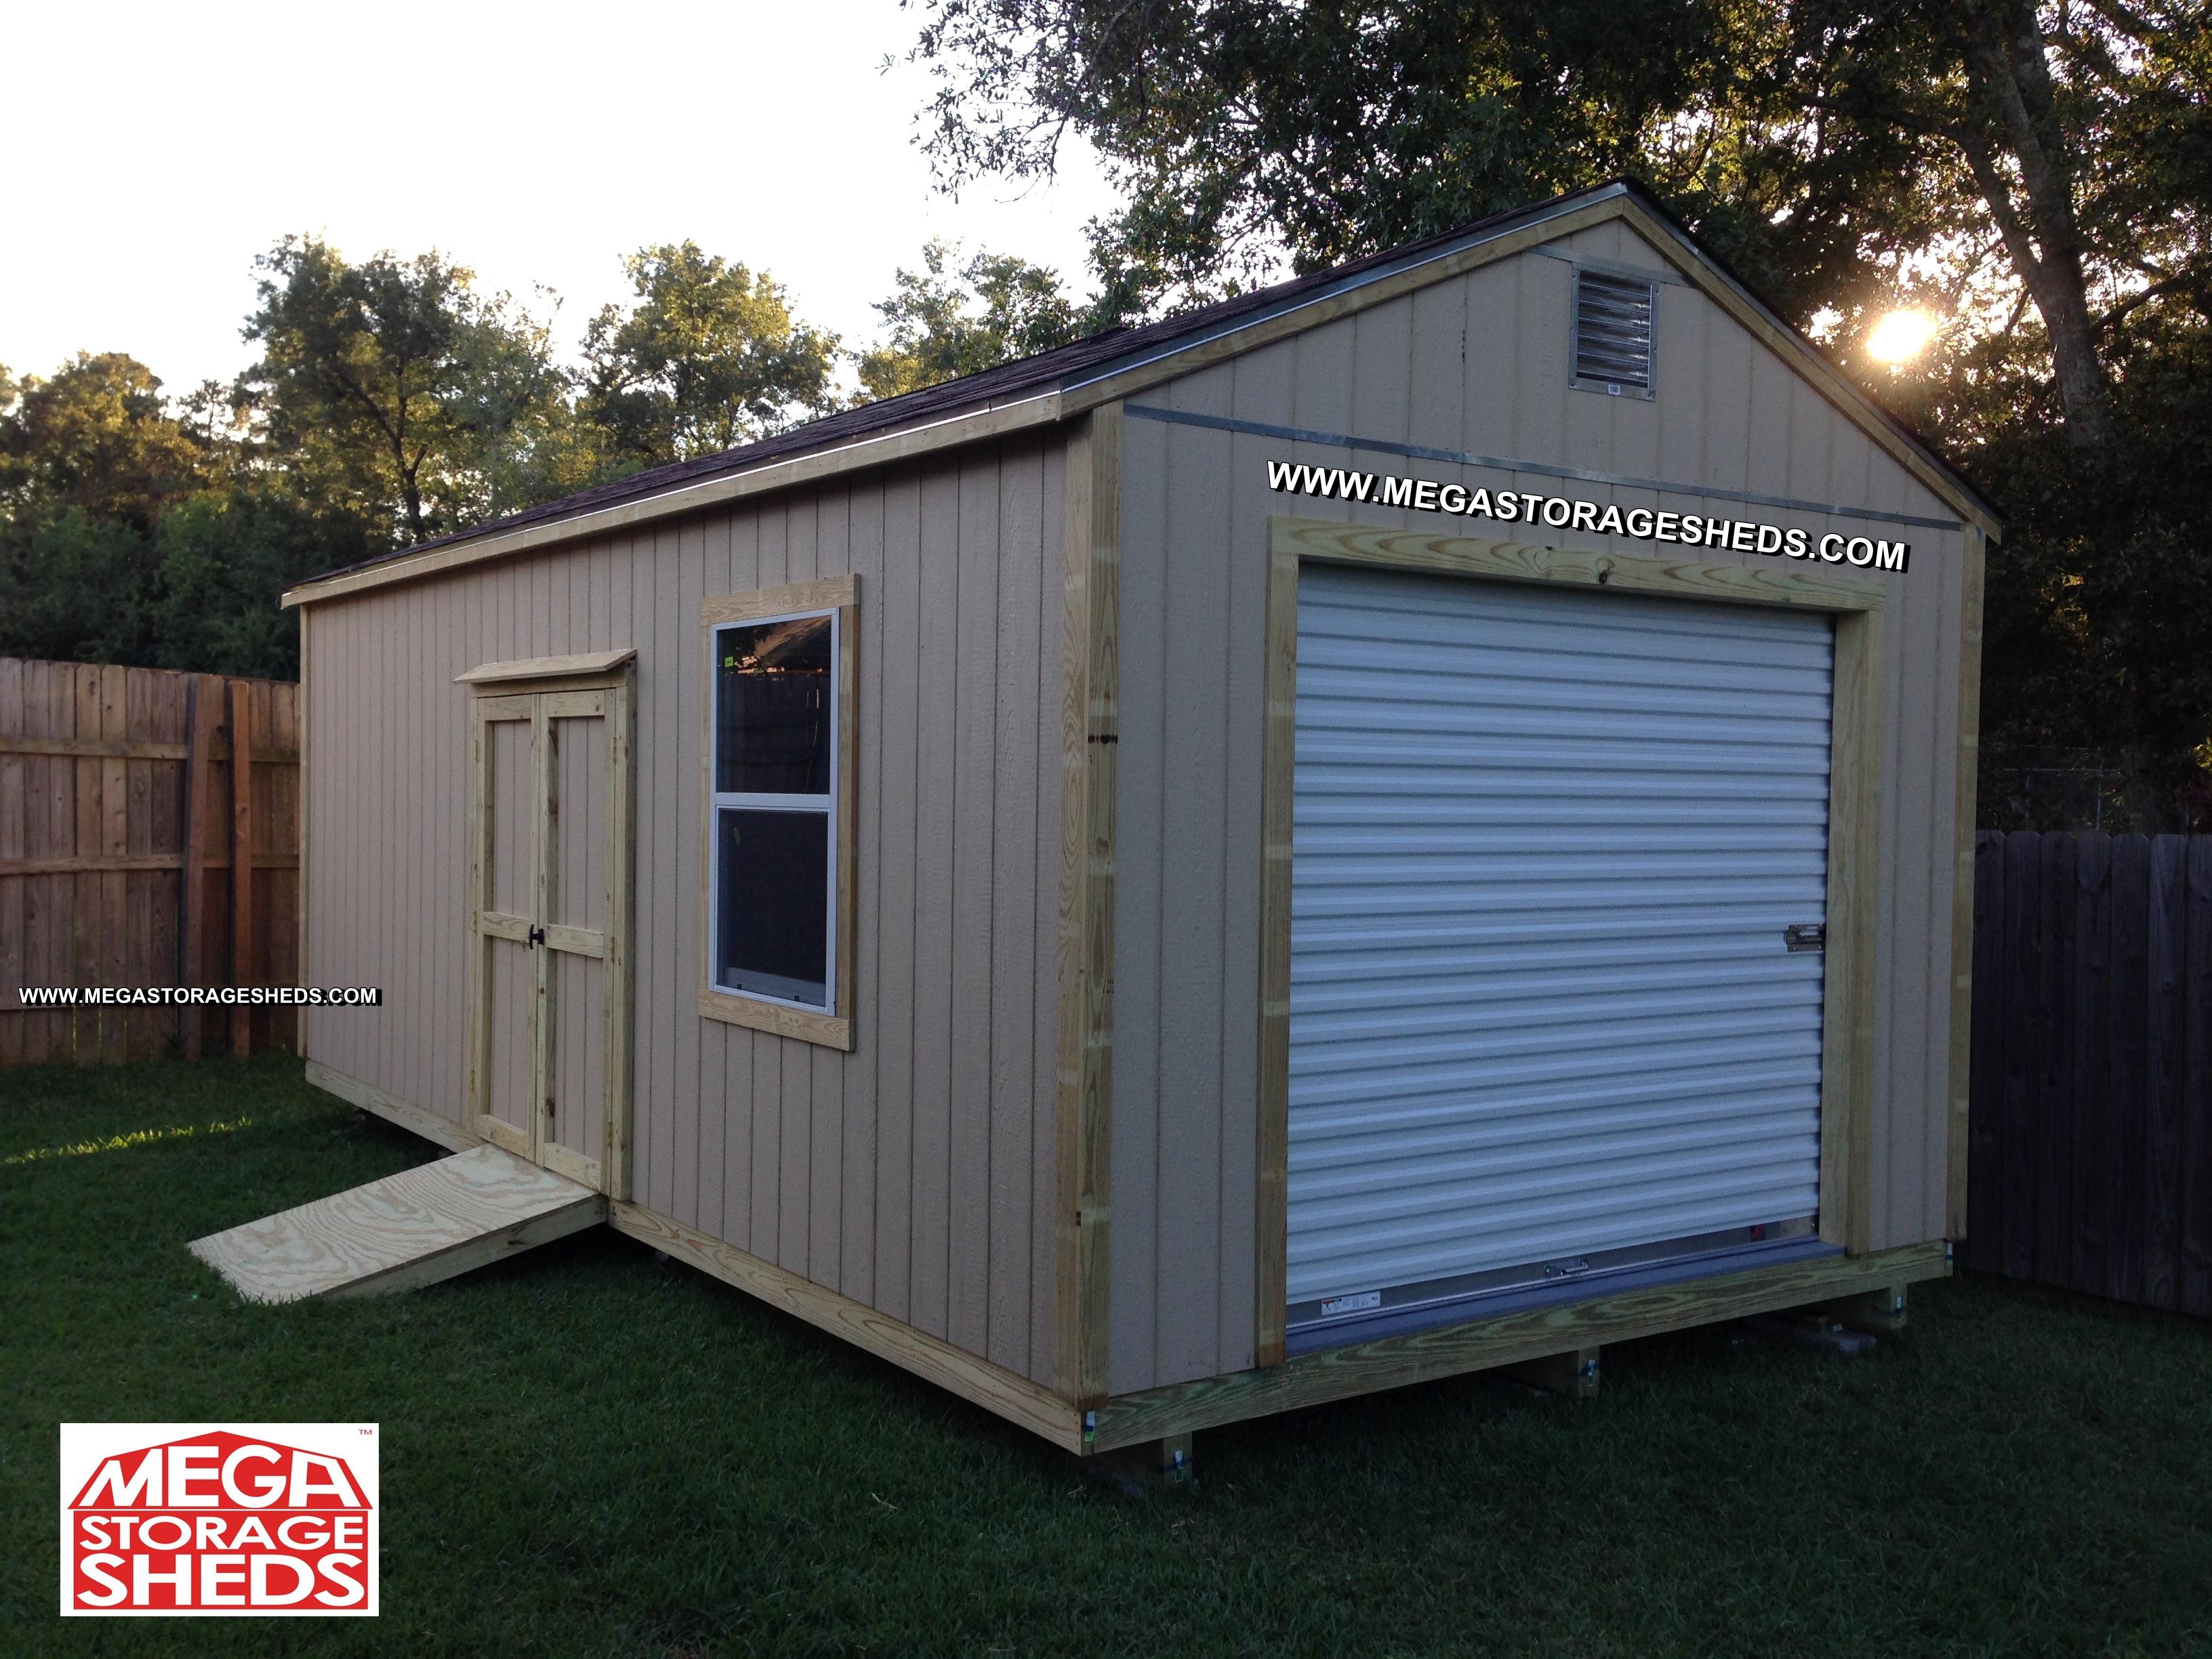 Mega Storage Sheds Options Roll Up Doors regarding dimensions 3264 X 2448